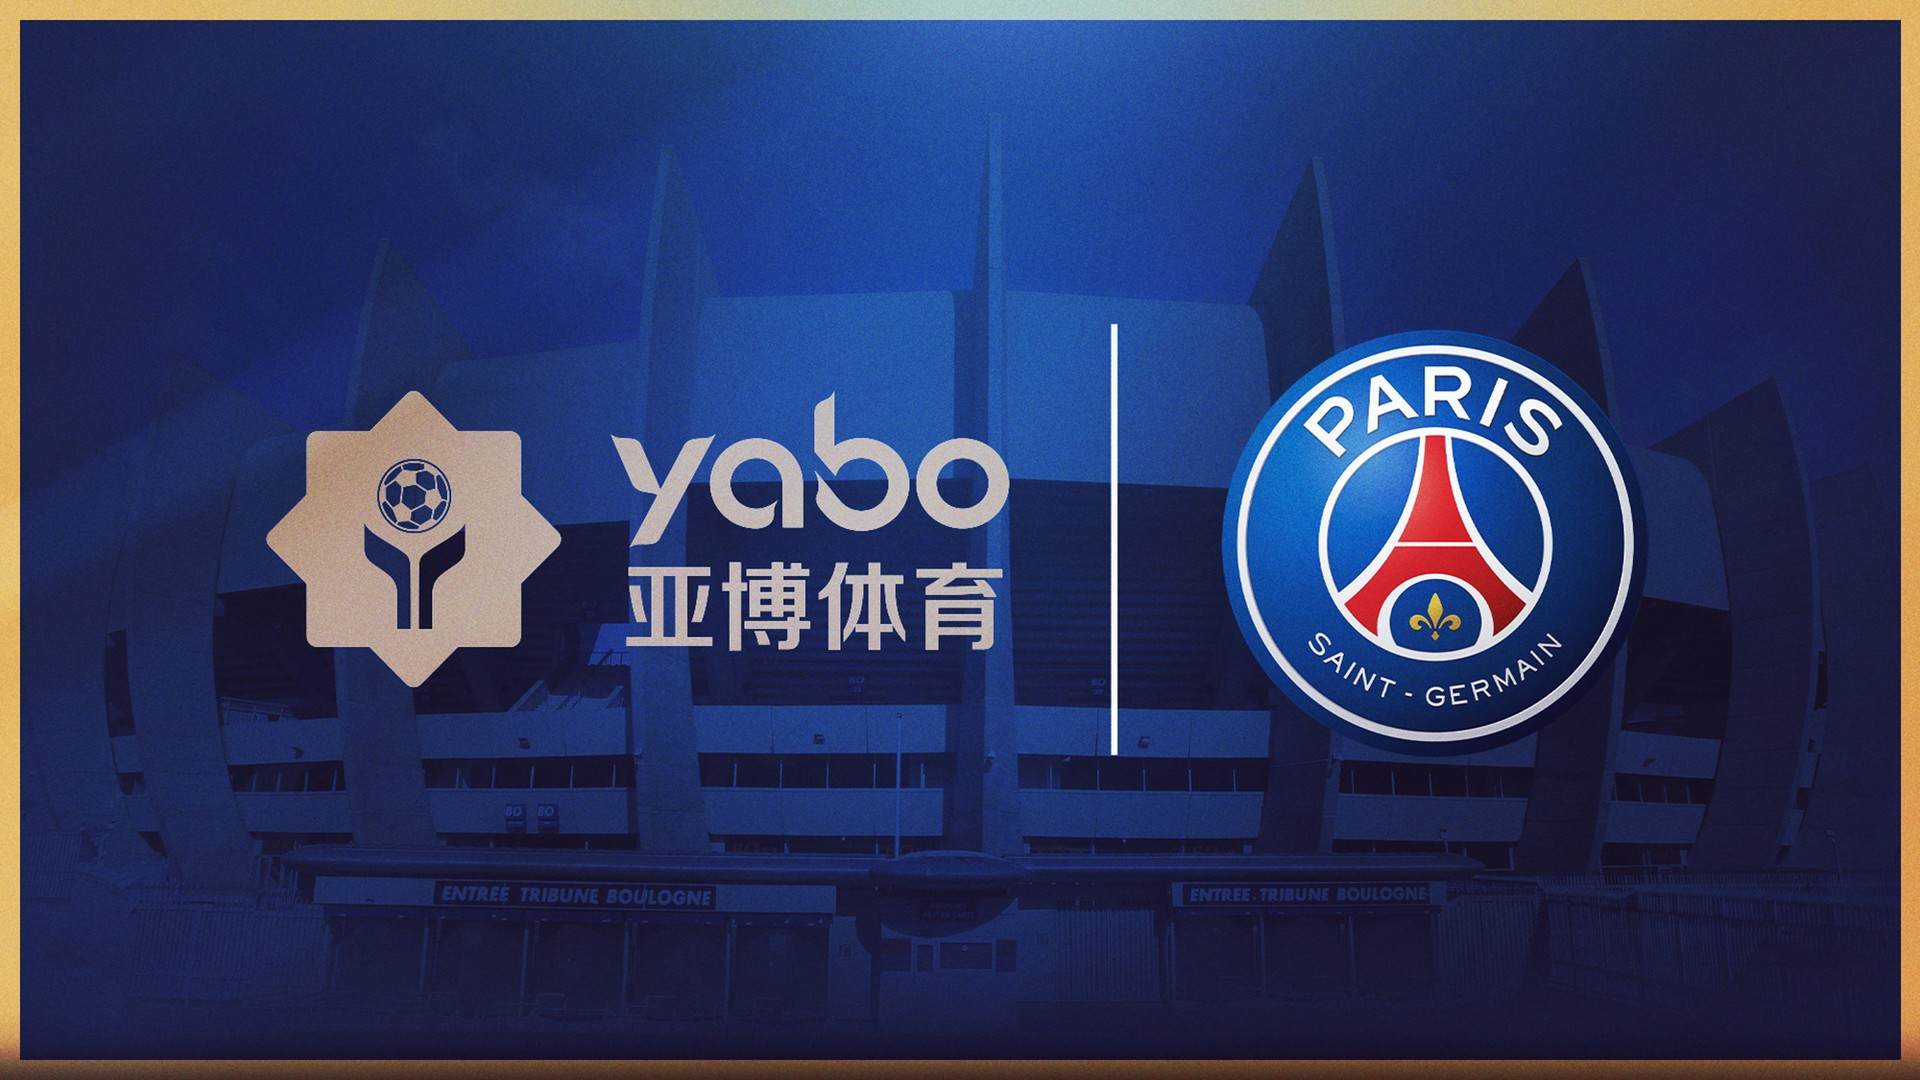 Yabo Sports x Paris SG (football) 2020